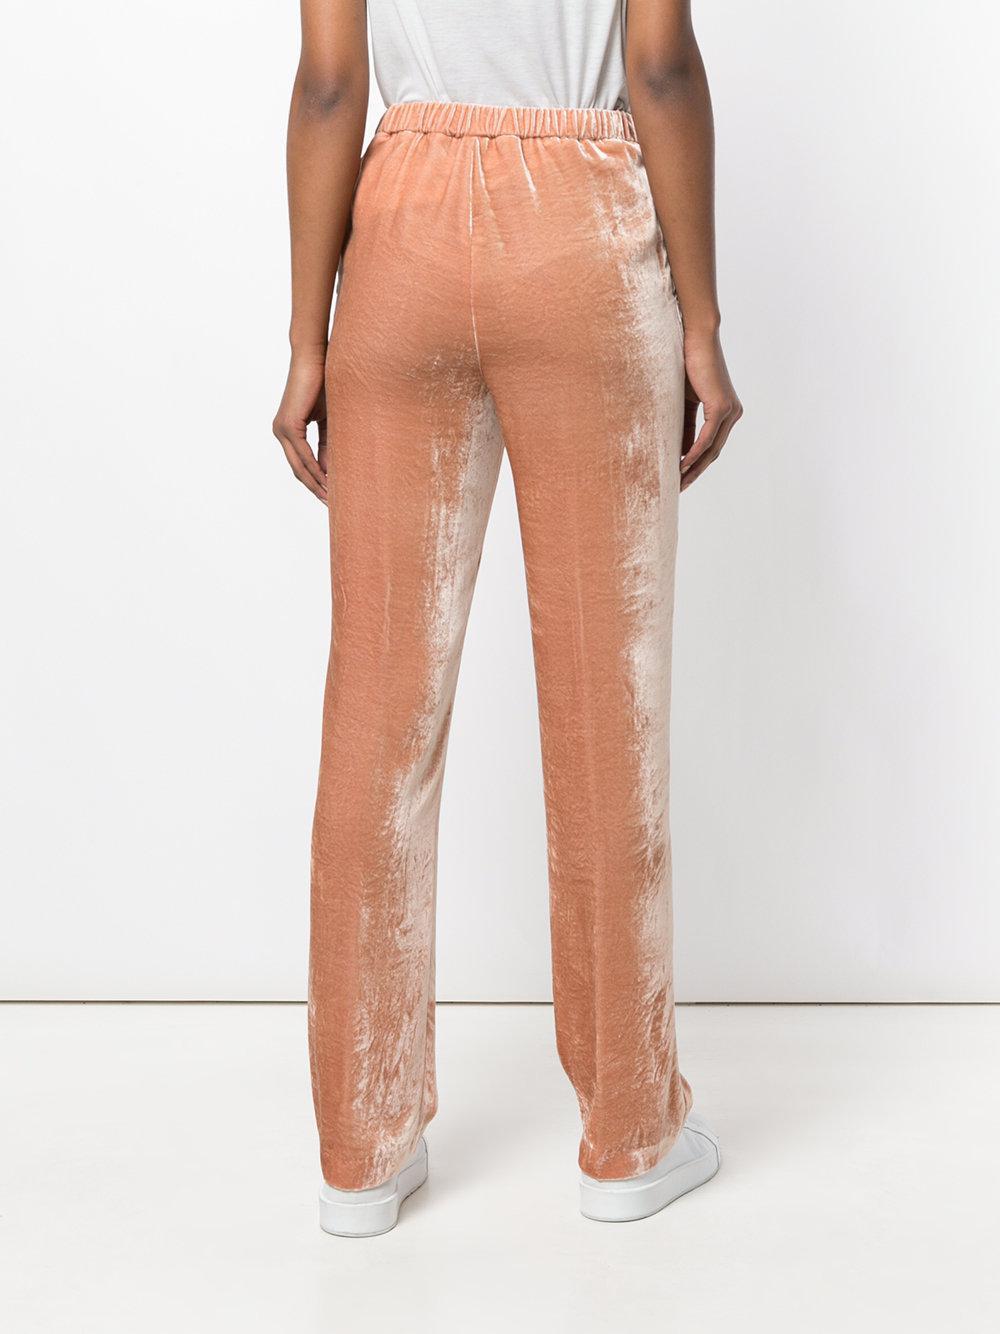 Vanda trousers - Pink & Purple Golden Goose b1W5odO